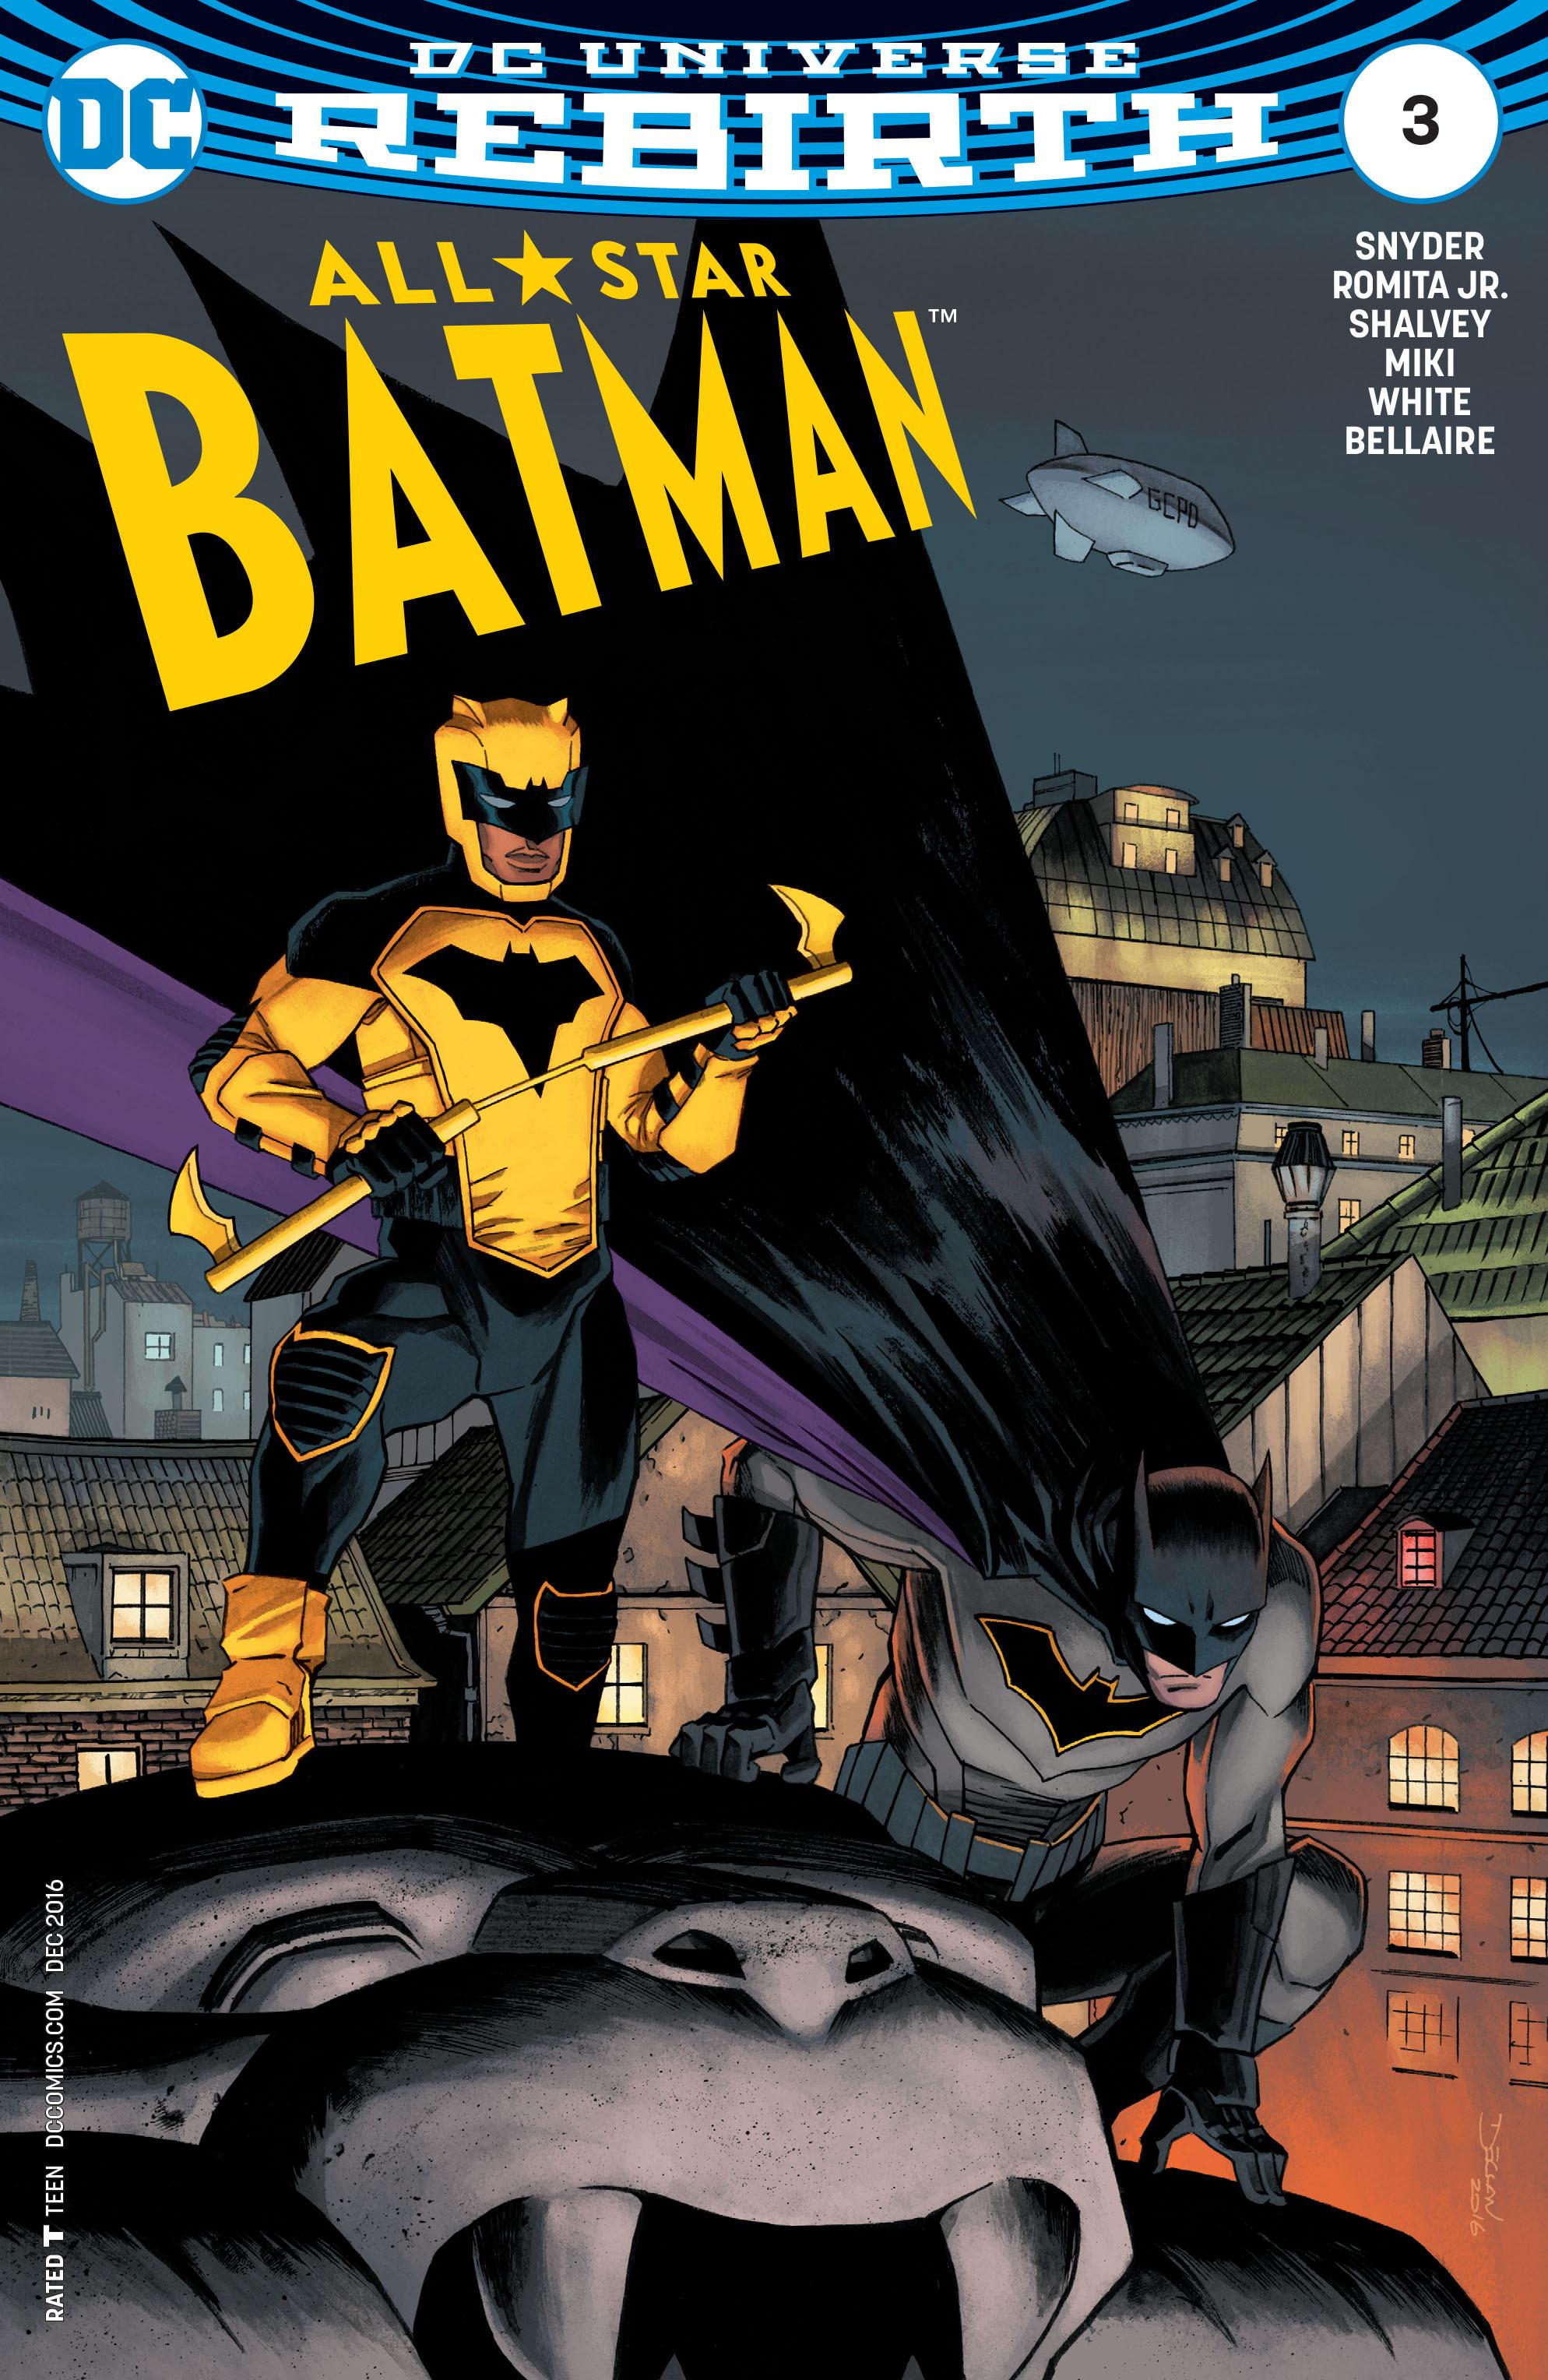 Read online All-Star Batman comic -  Issue #3 - 4